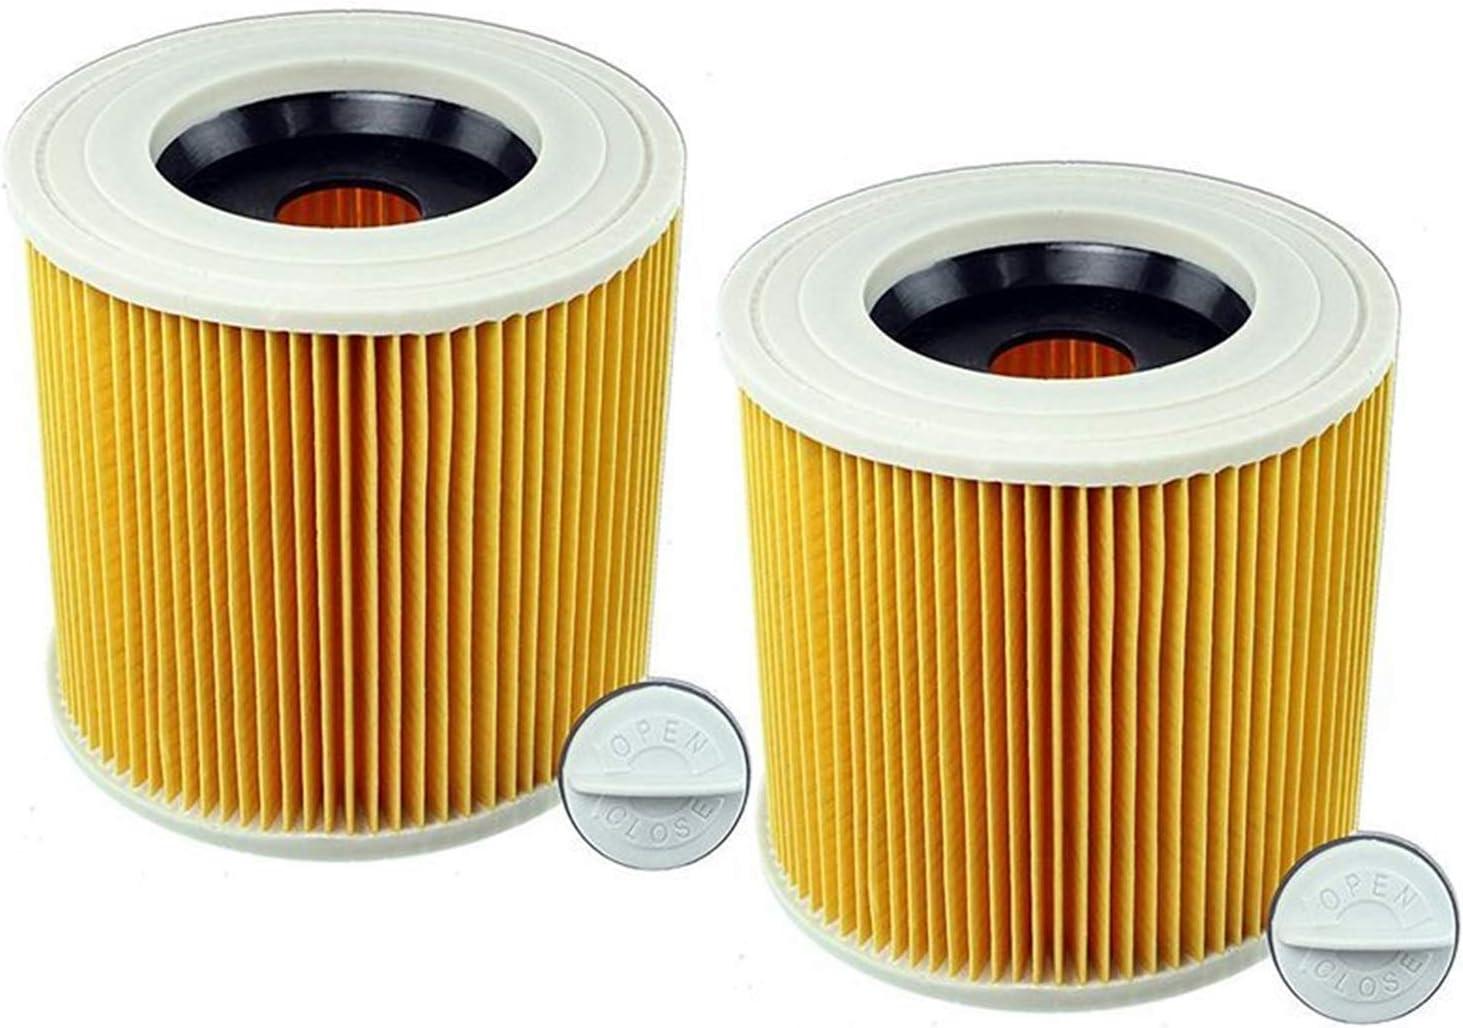 DONGYAO 교환 카트리지 필터는 적합한 카 처 WD2200WD2240A2200VC6200 습식 및 건식 진공 청소기(컬러로 표시)를 진공 청소기(컬러로 표시)